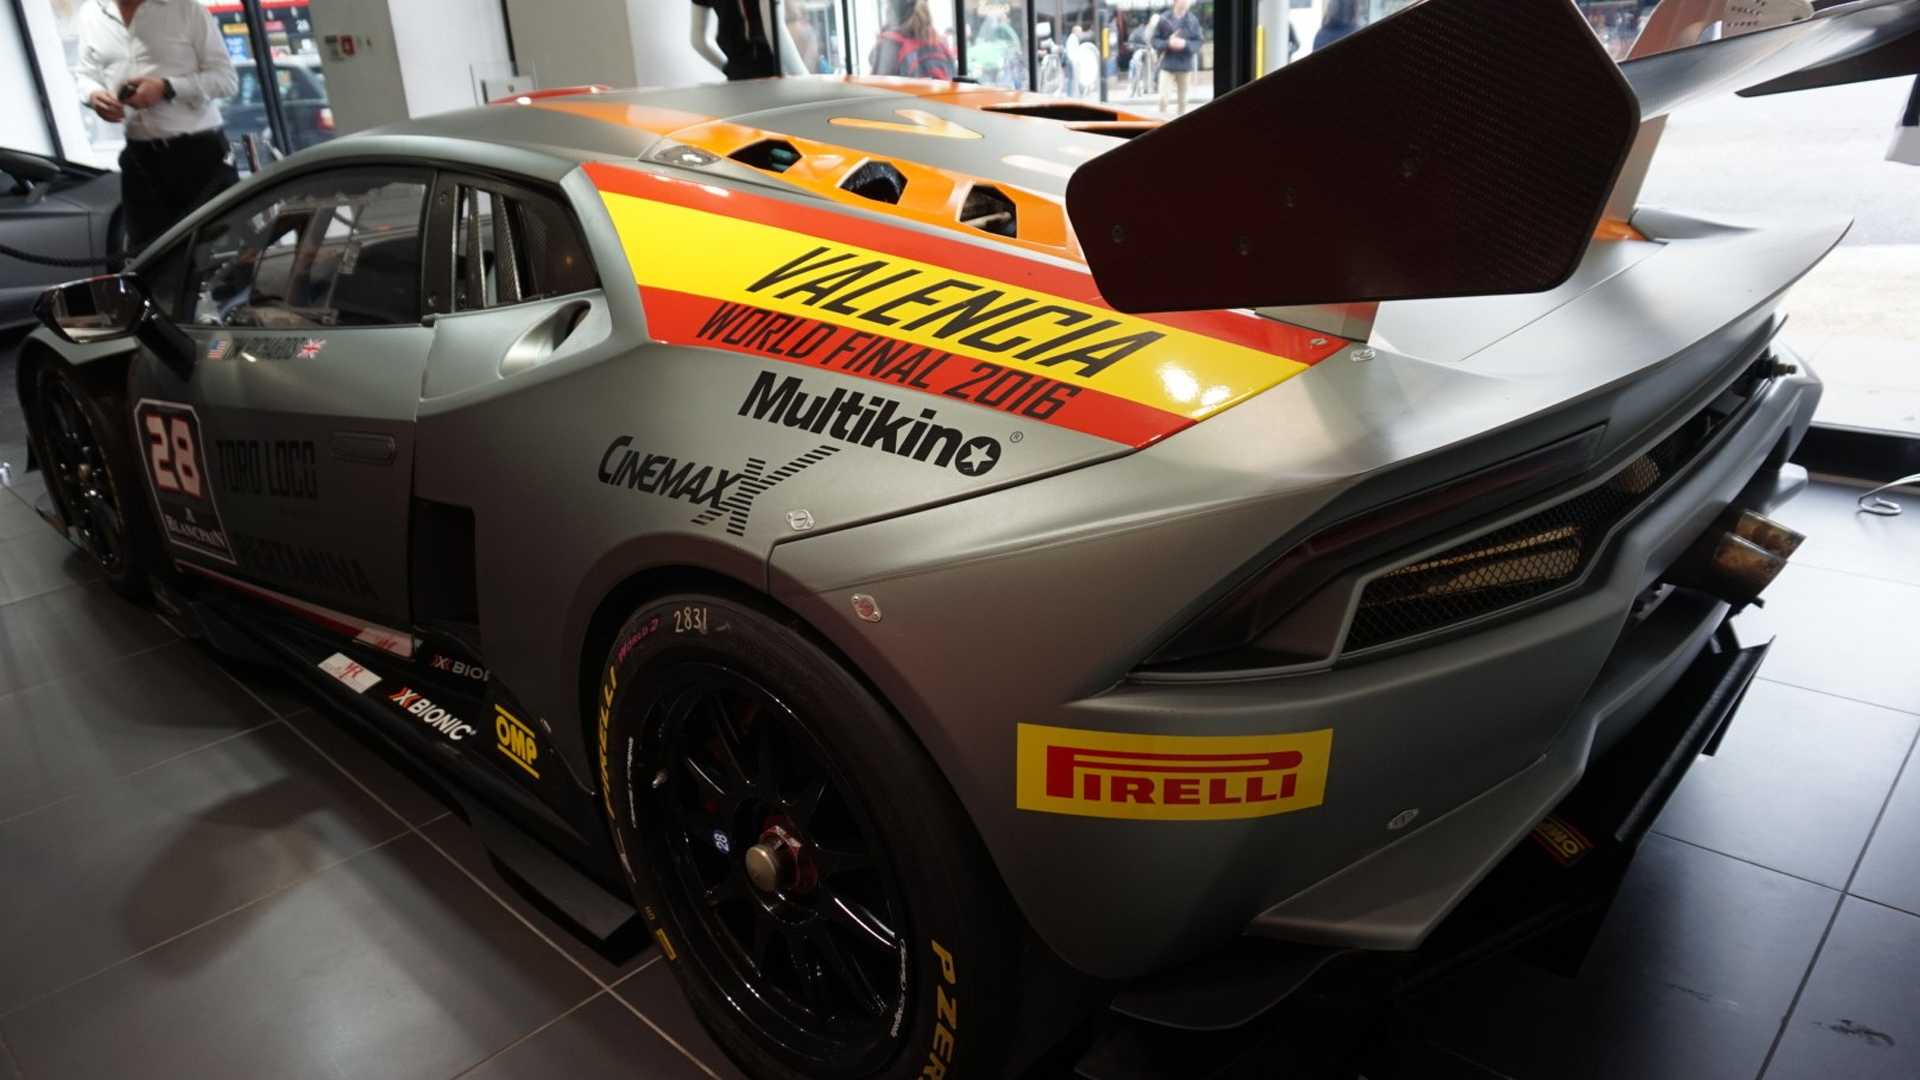 At $180k, This Lambo Huracan Super Trofeo Racer Costs Less ...   2016 Lamborghini Huracan Super Trofeo